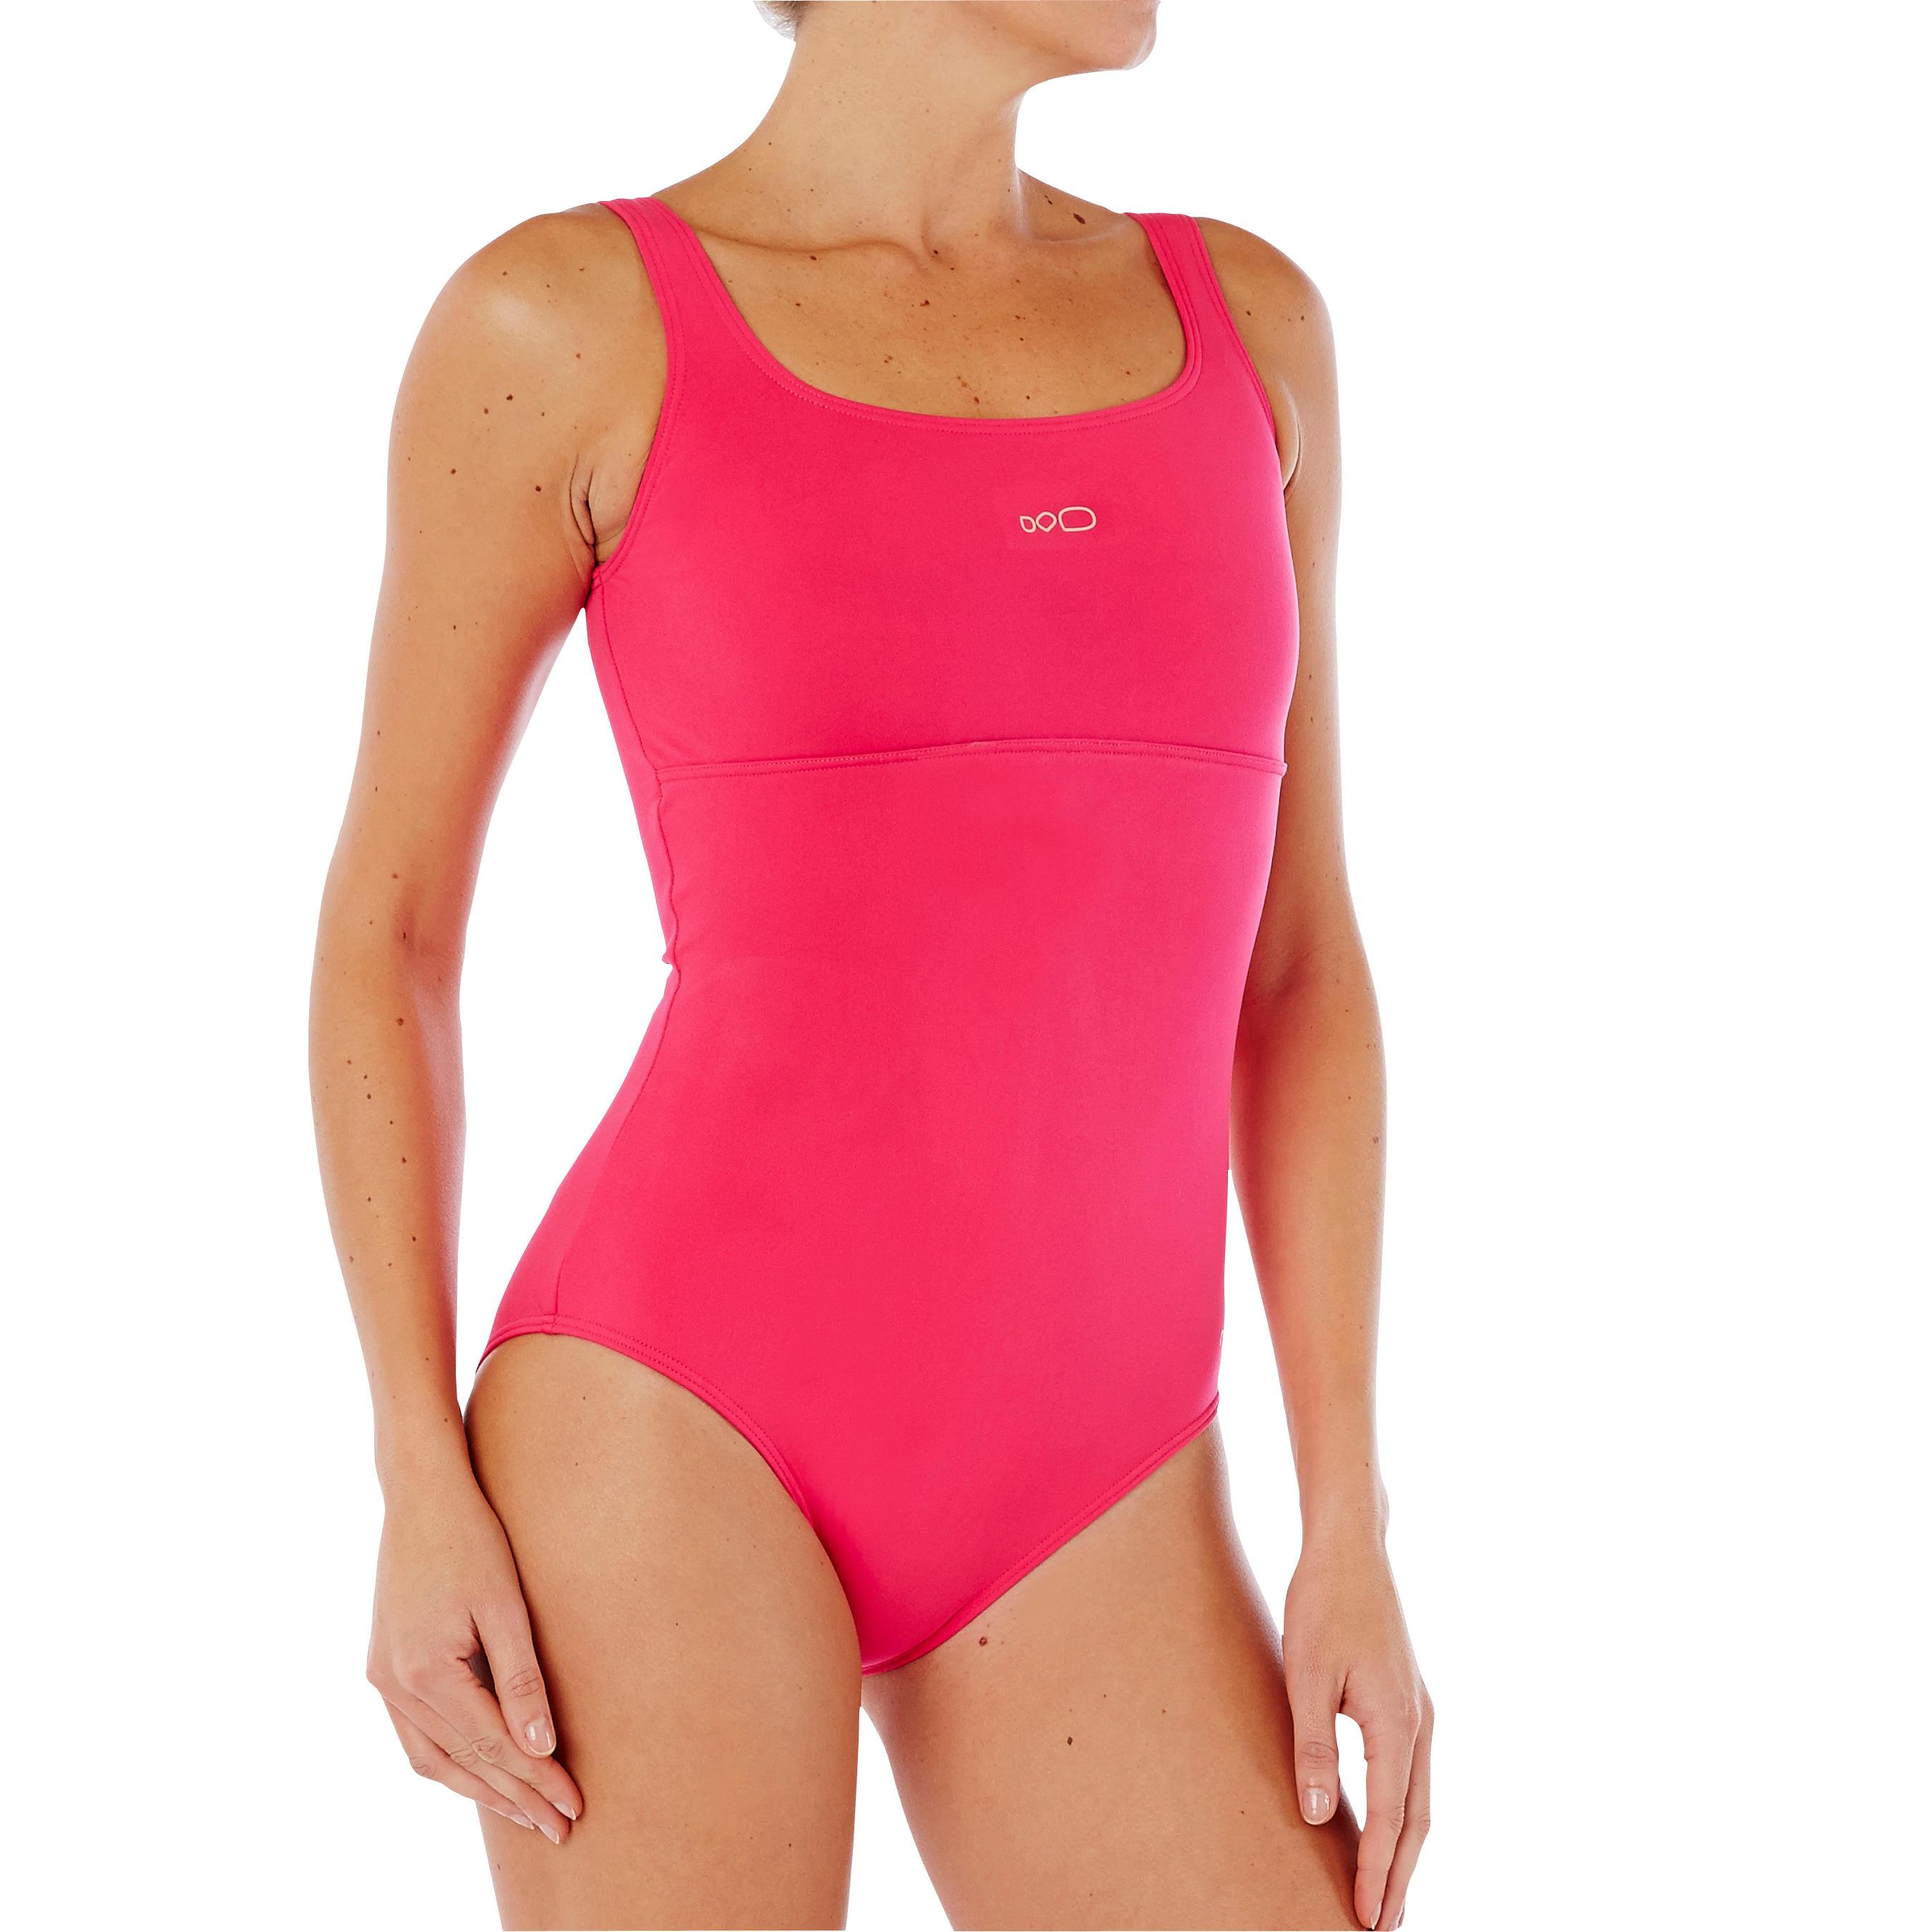 Heva+ Women's One-Piece Swimsuit - Pink